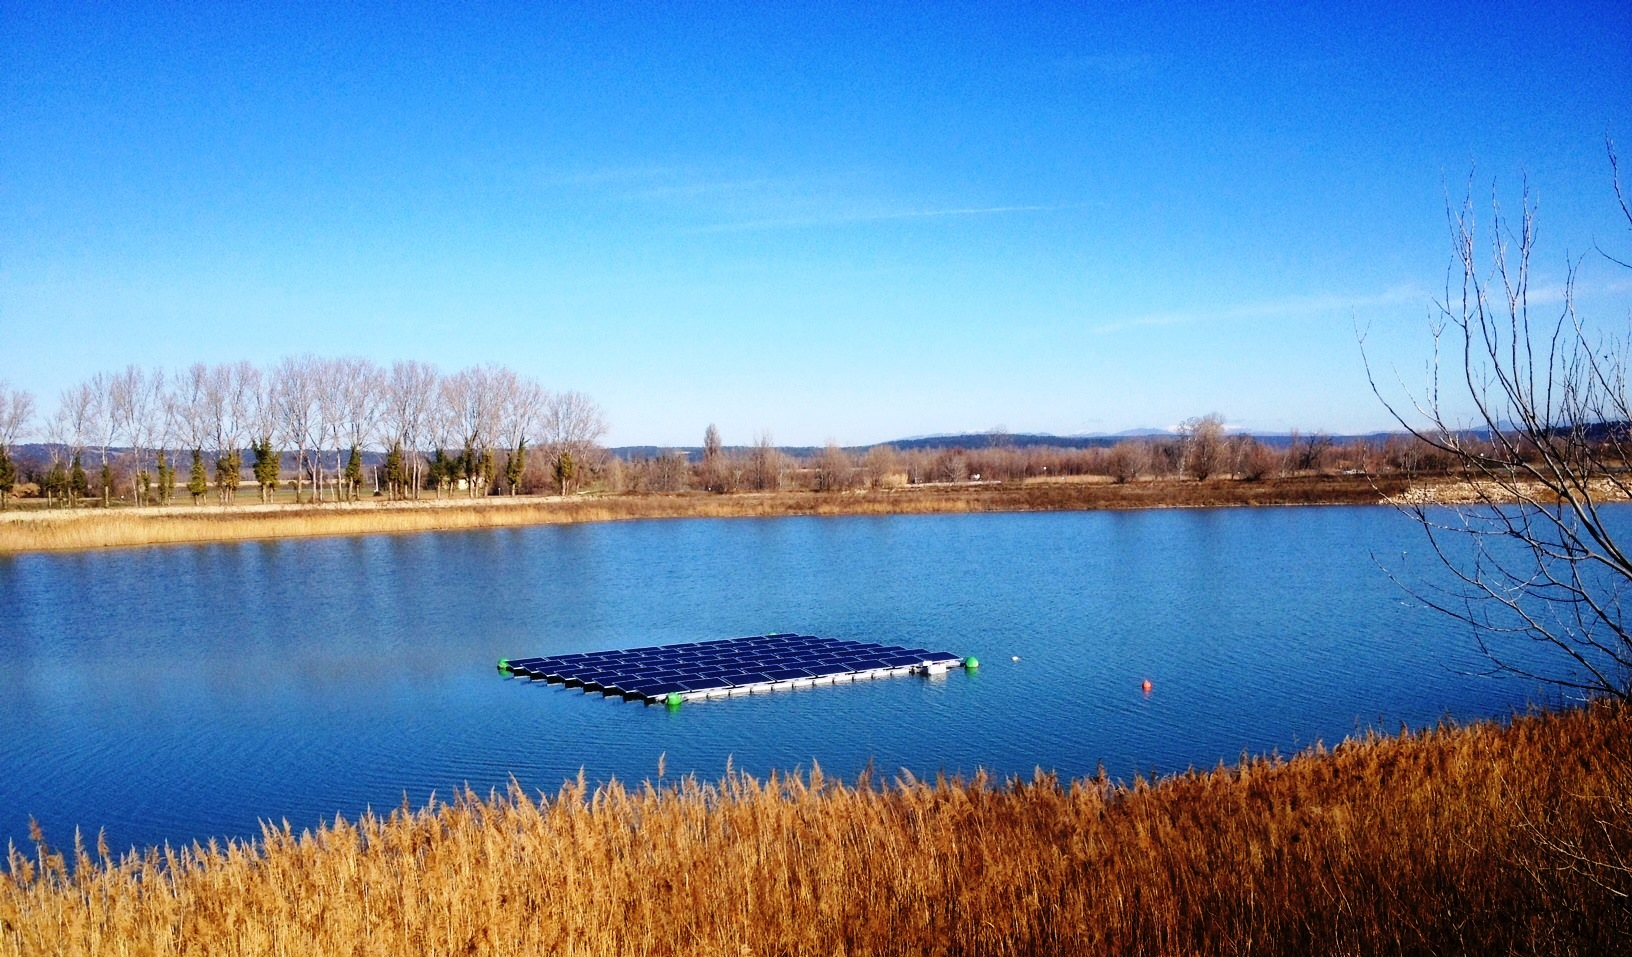 Energies renouvelables : Engie innove tous azimuts